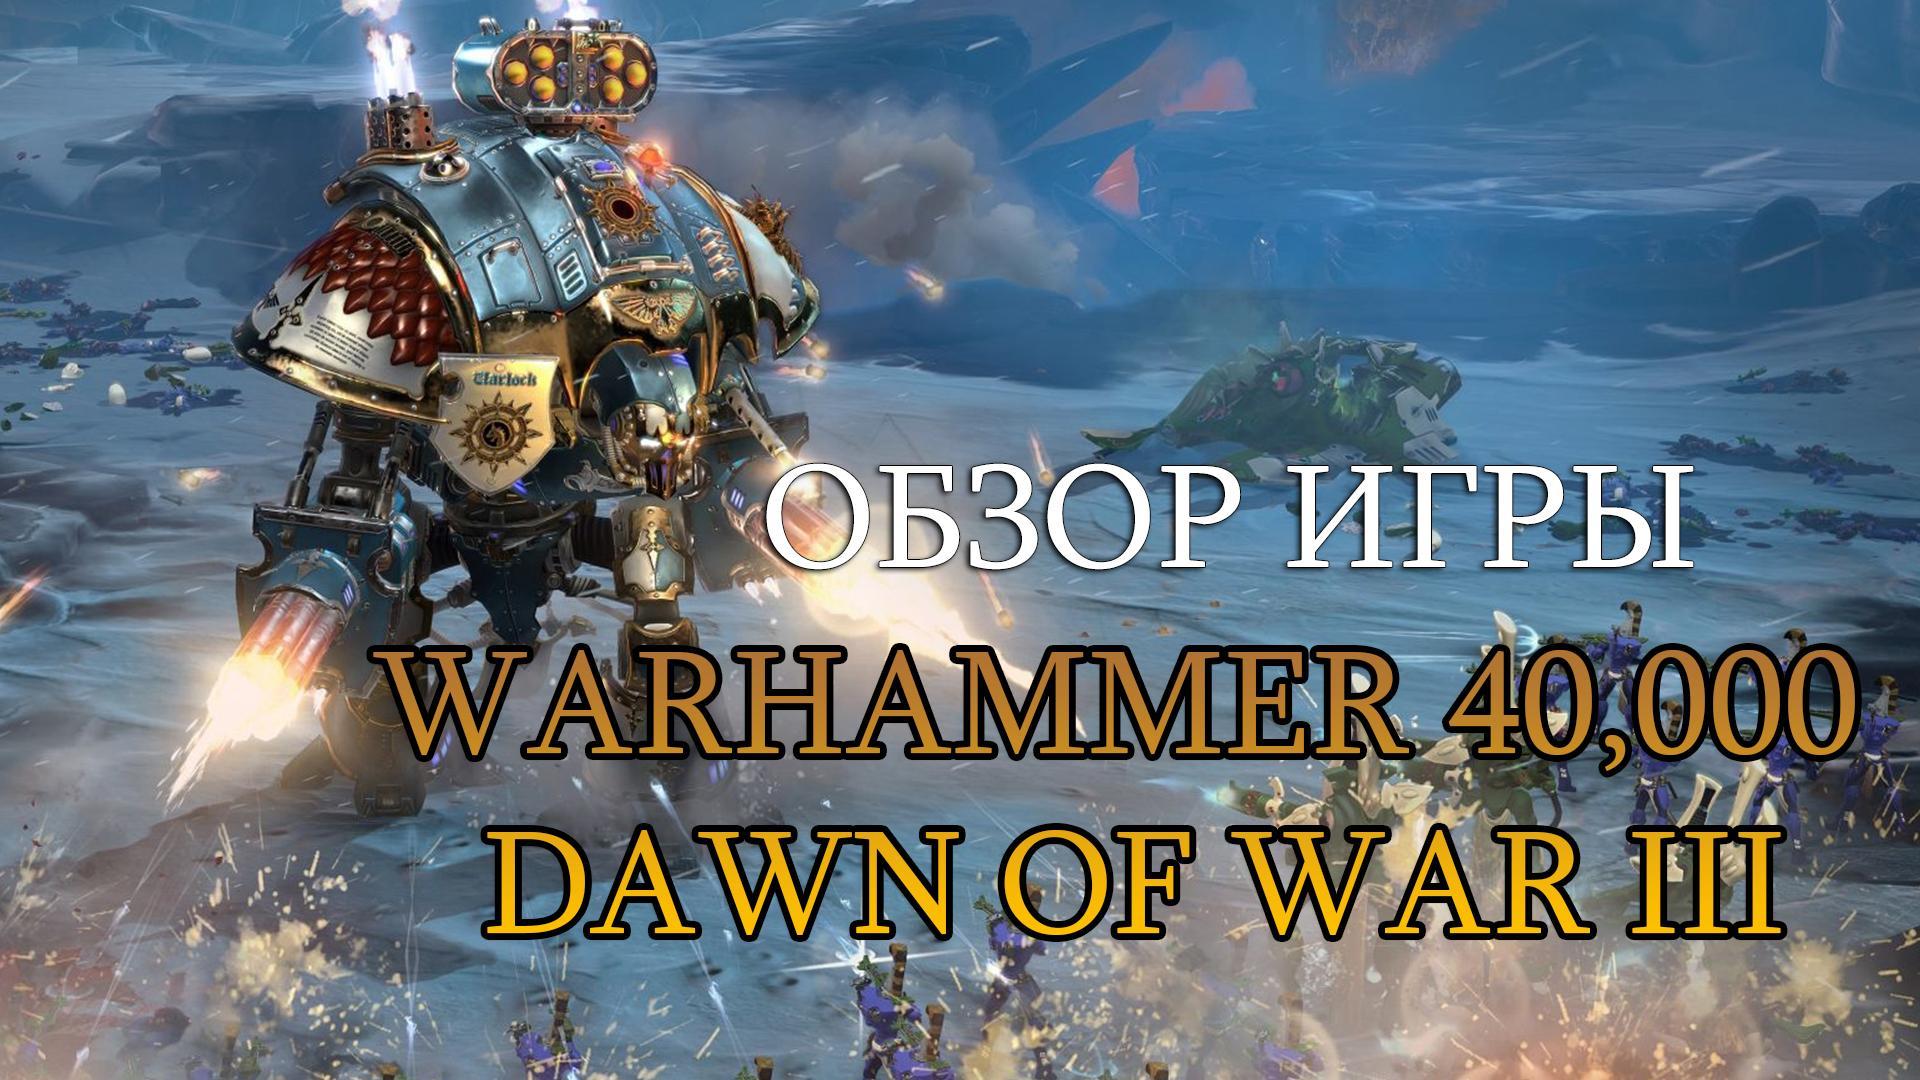 Warhammer-40000-Dawn-of-War-3